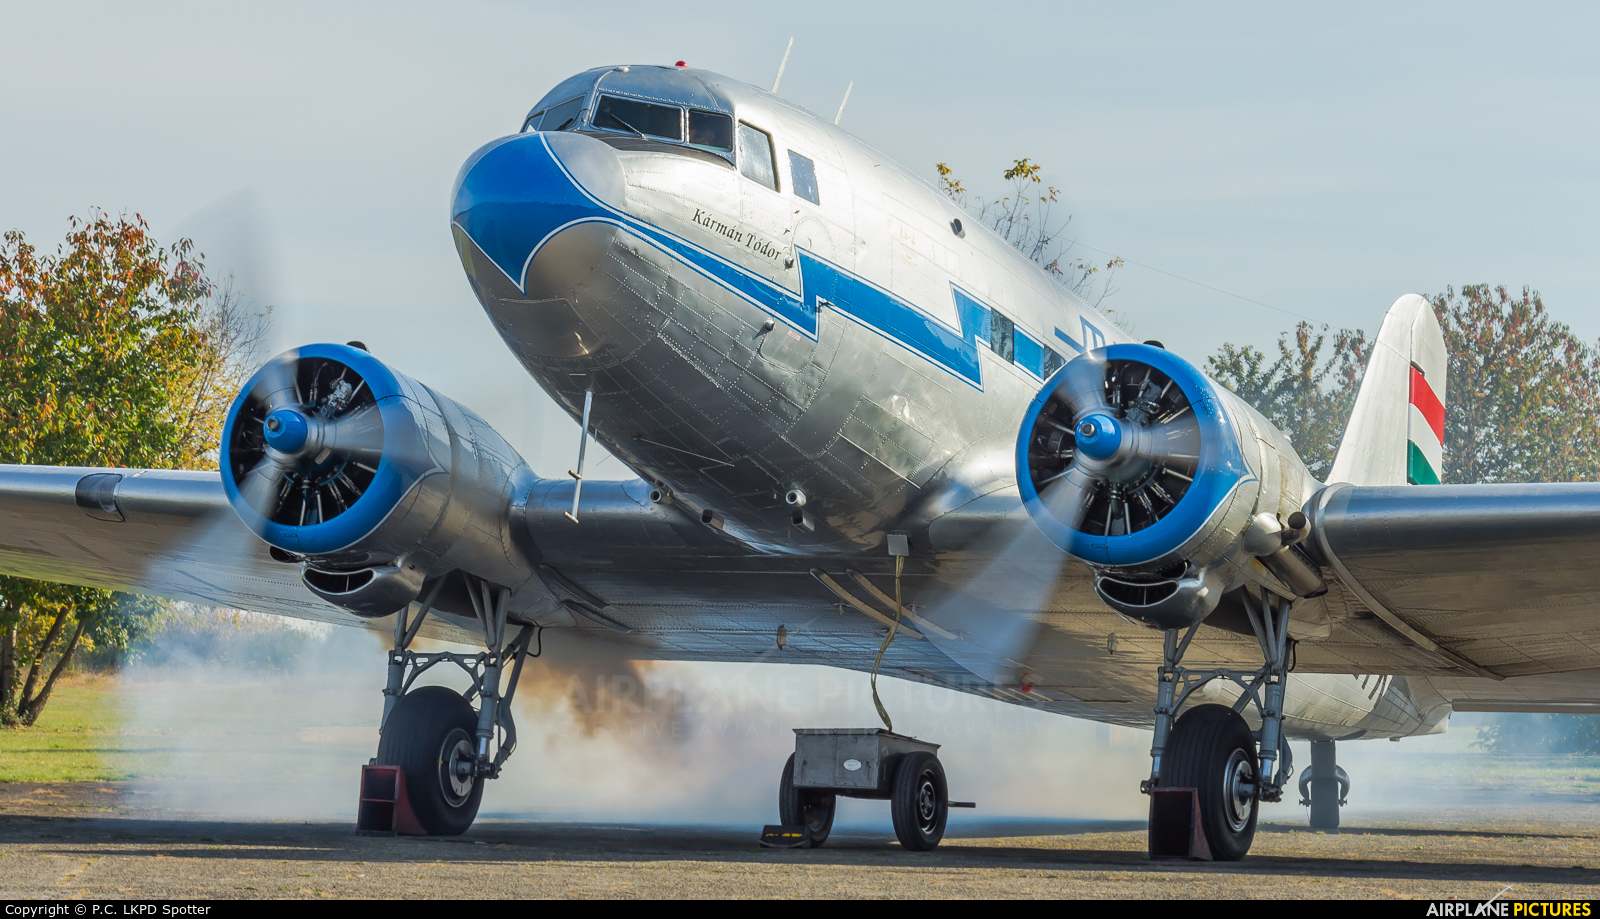 Malev Sunflower Aviation (Gold Ttimer Foundation) HA-LIX aircraft at Budaors